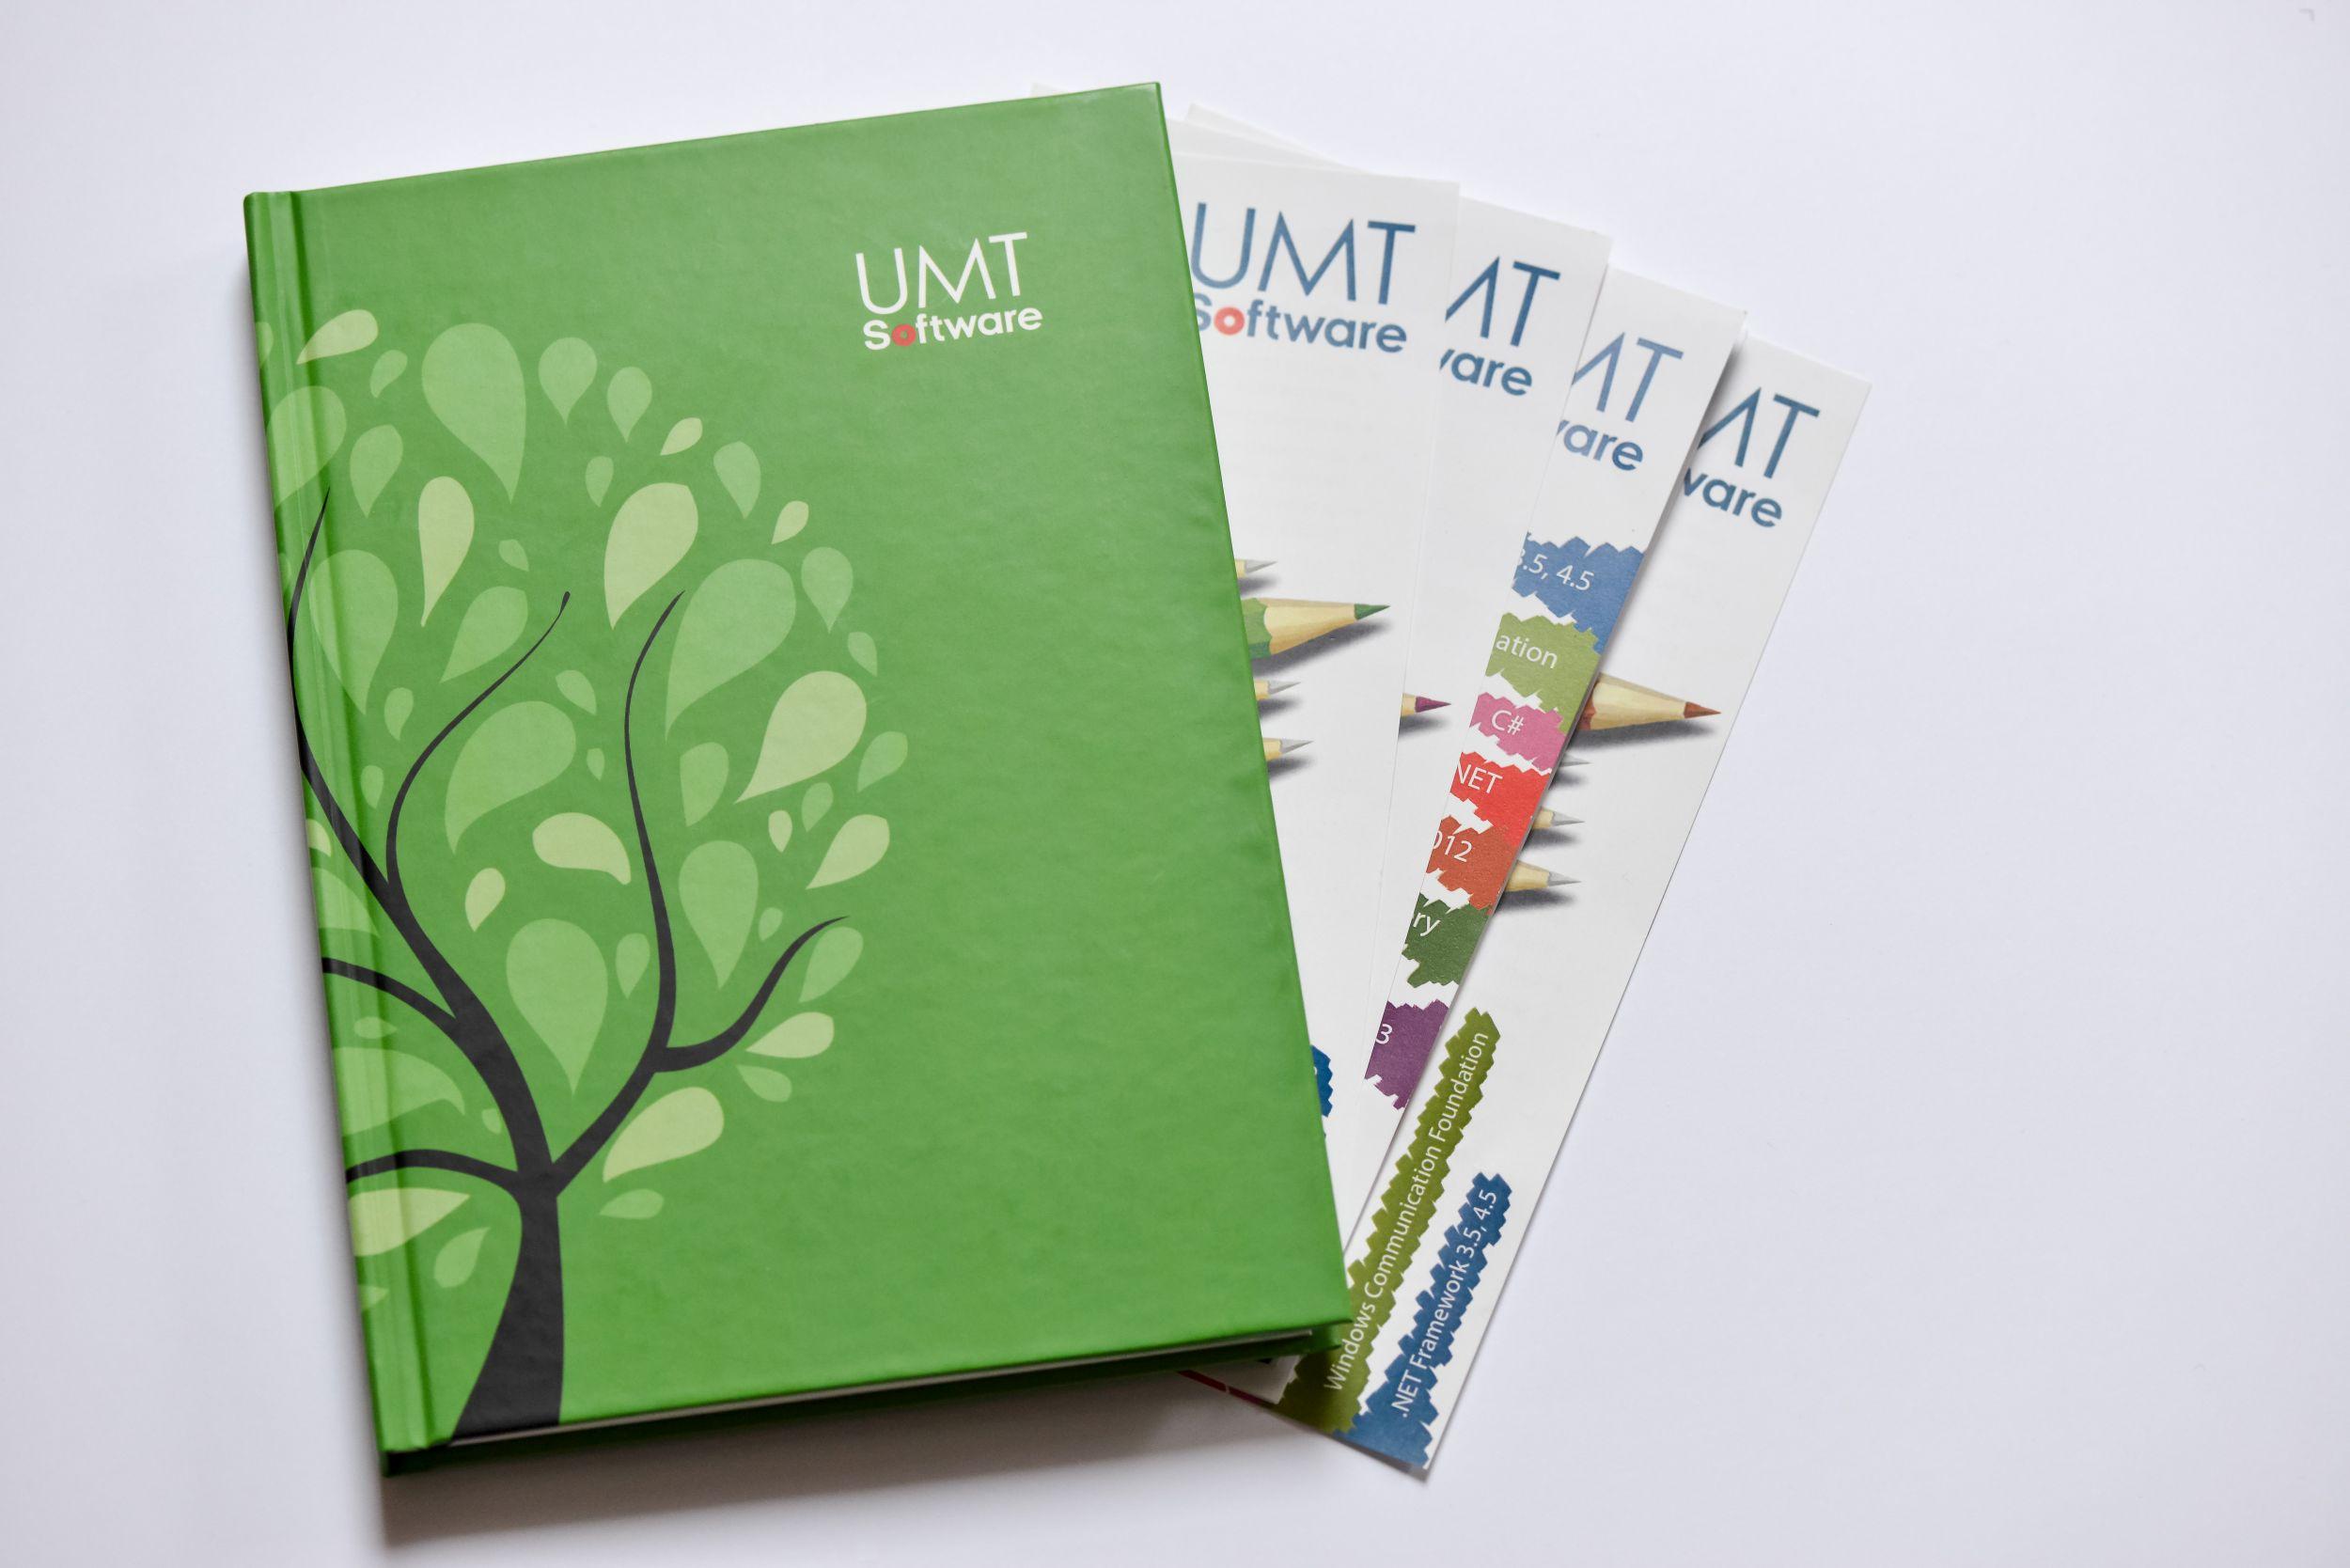 UMT Software